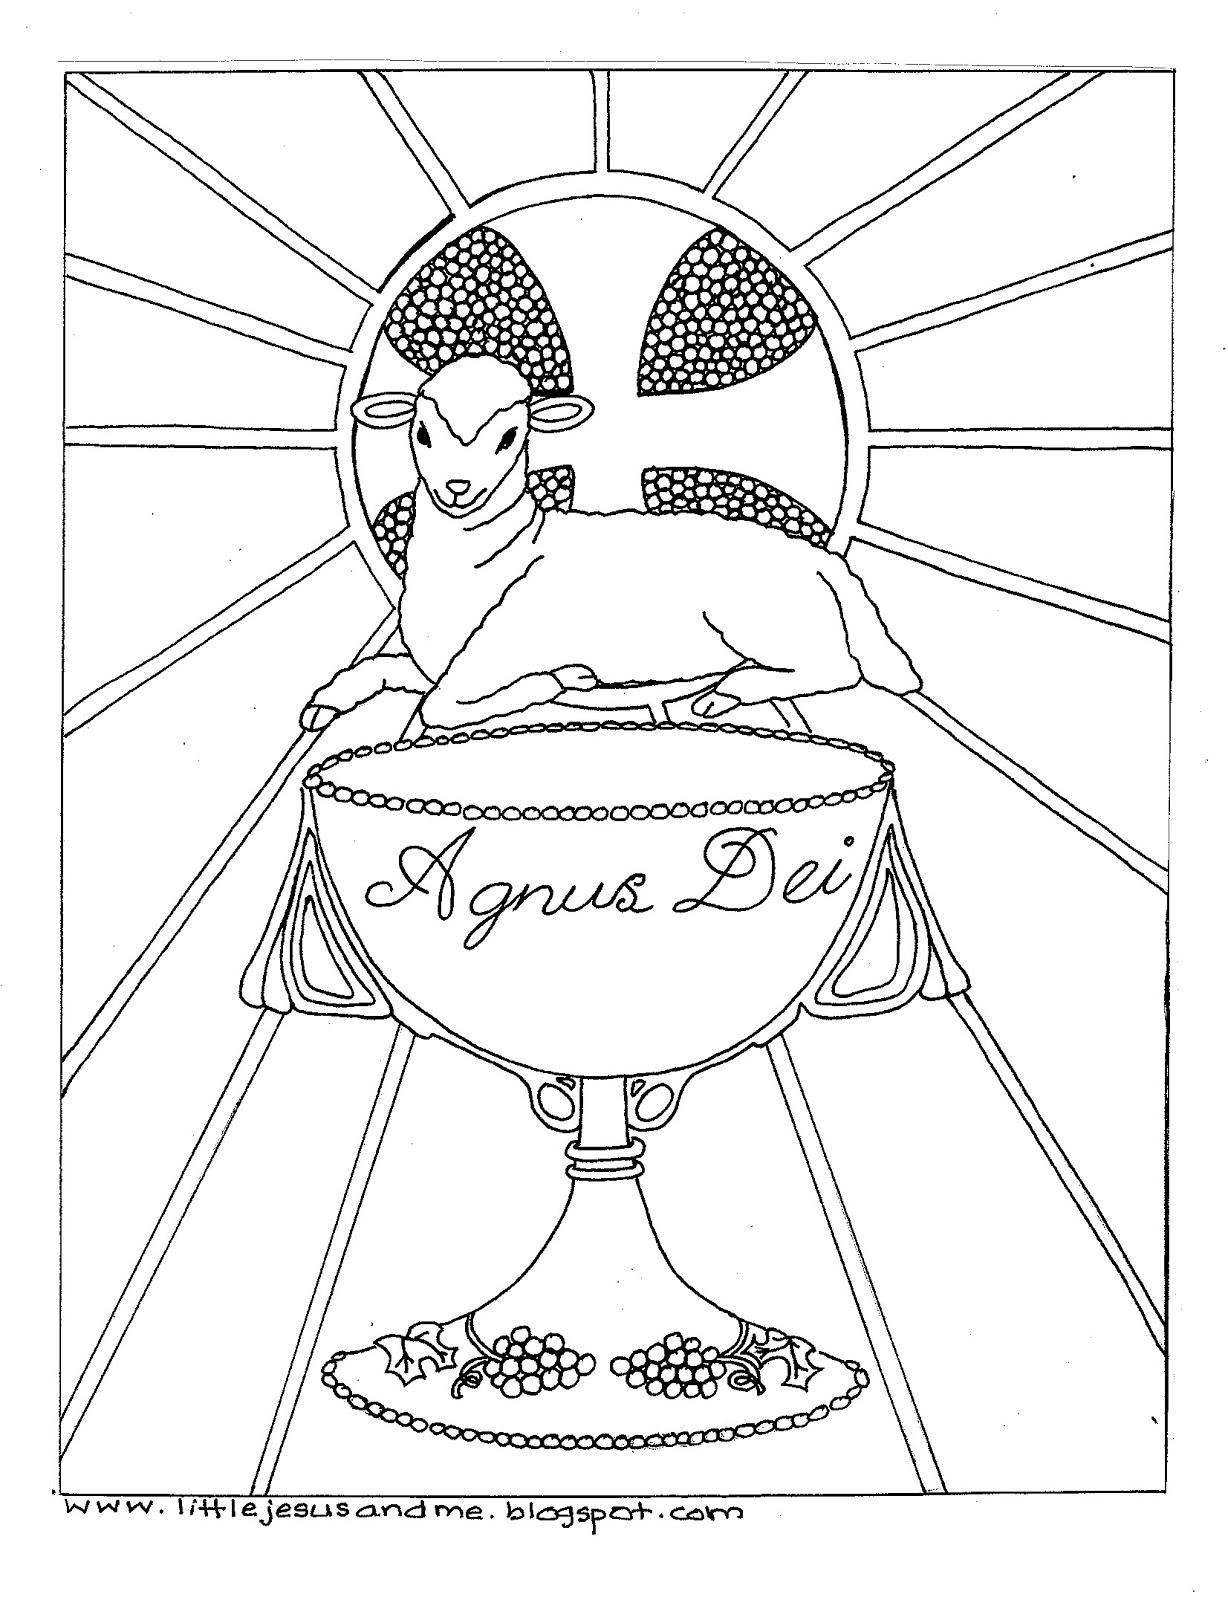 Lamb Of God Drawing at GetDrawings.com   Free for personal use Lamb ... for Jesus Lamb Of God Clip Art  568zmd